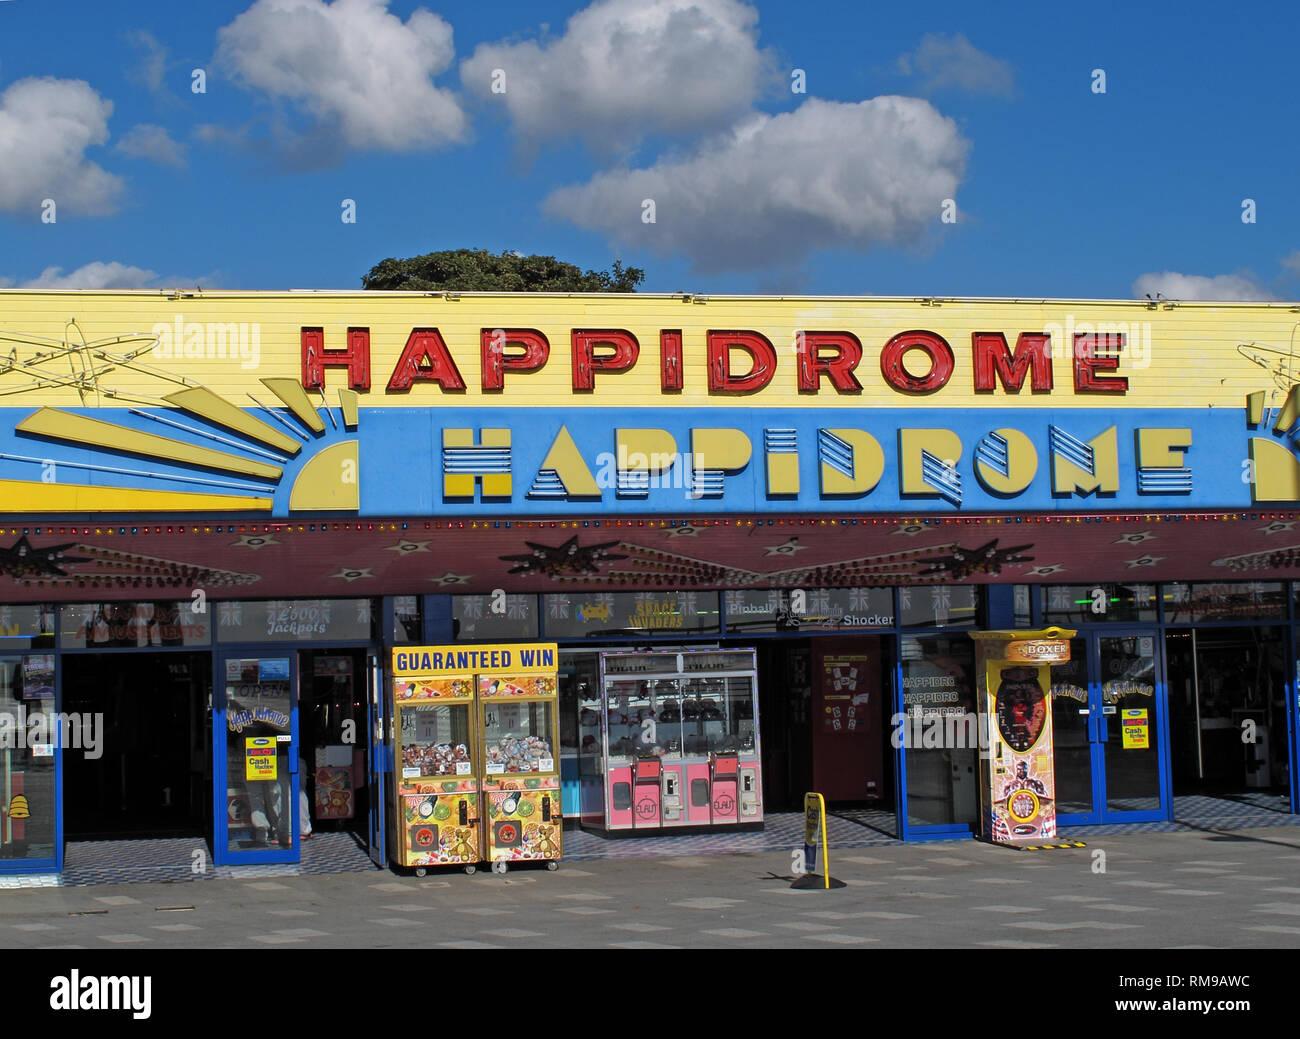 GoTonySmith,HotpixUK,@HotpixUK,England,UK,GB,Southend,Seaside,town,Essex,South East England,classic,Southend-on-Sea,Southend on Sea,southeastern,English,english seaside,resort,Last Resort,seaside resort,Southend-on-Sea Borough Council,Borough,Council,Shakedown,Great London Rideout,seafront,Amusement center,Amusement centre,Amusements,Happidrome Arcade,arcade,owner,Thieves,thief,theft,stolen,break-in,break in,guaranteed win,machines